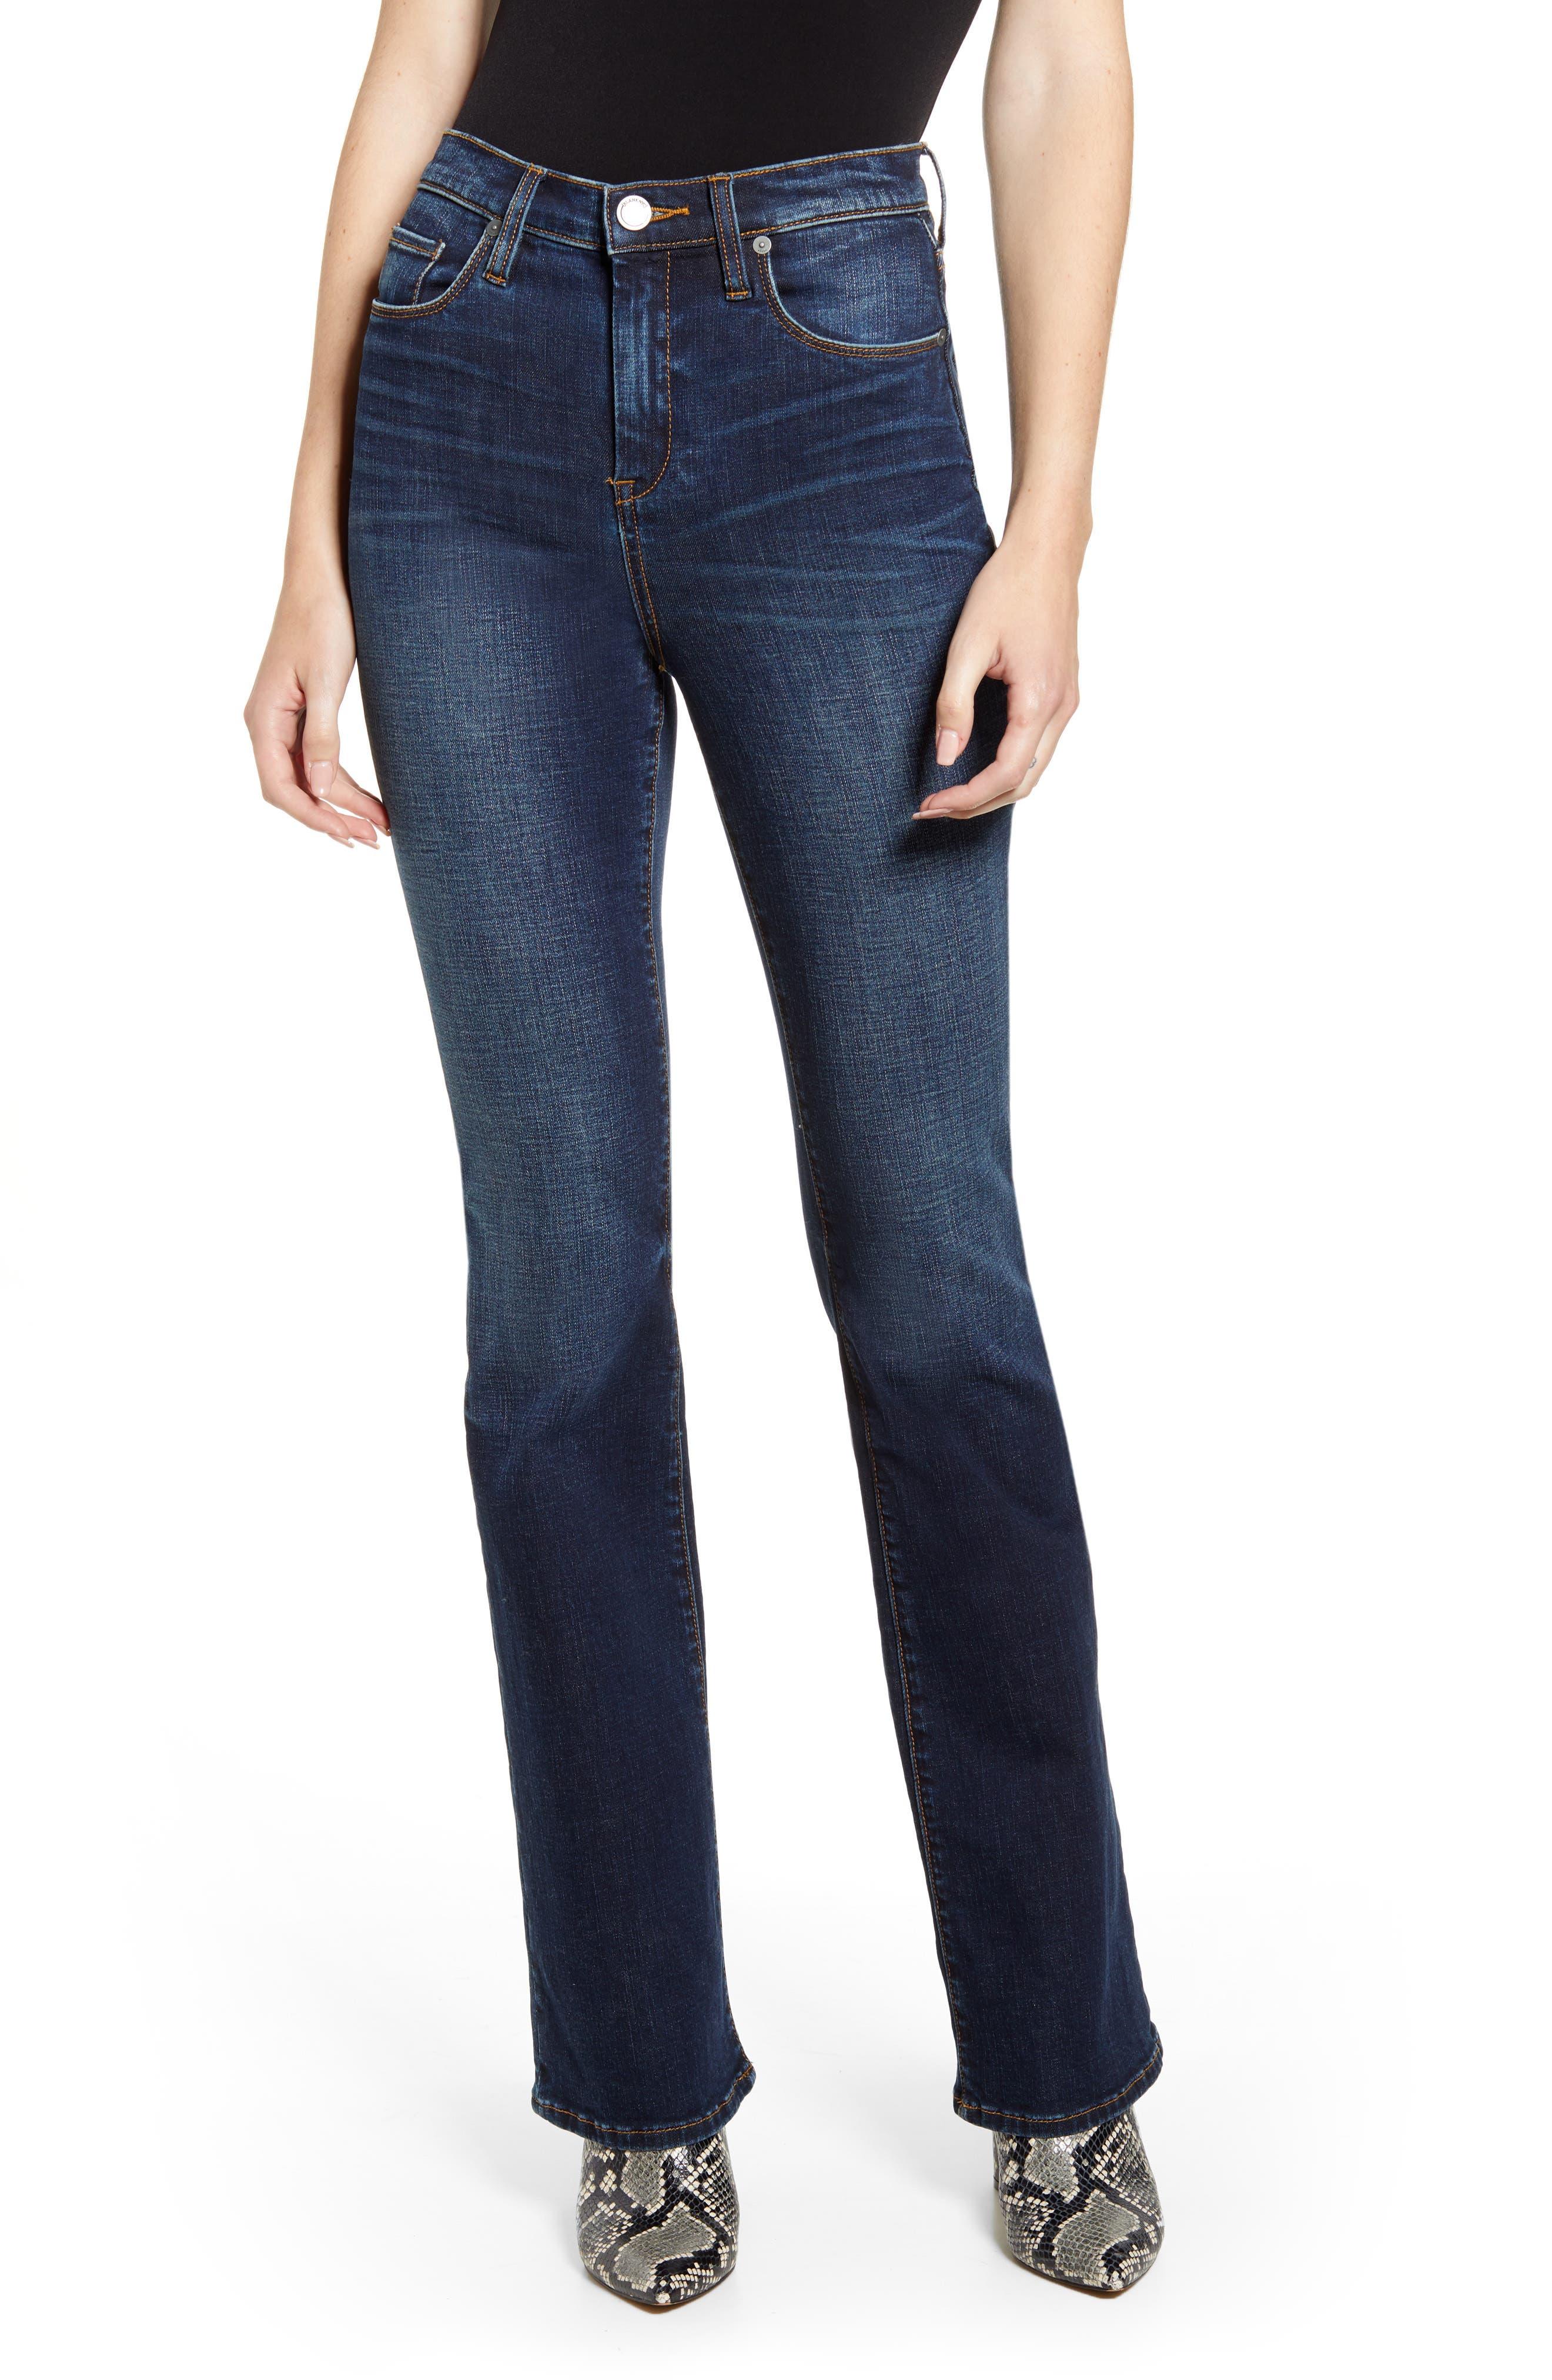 3371e6d25 Women's High Rise Flare & Wide Leg Jeans   Nordstrom